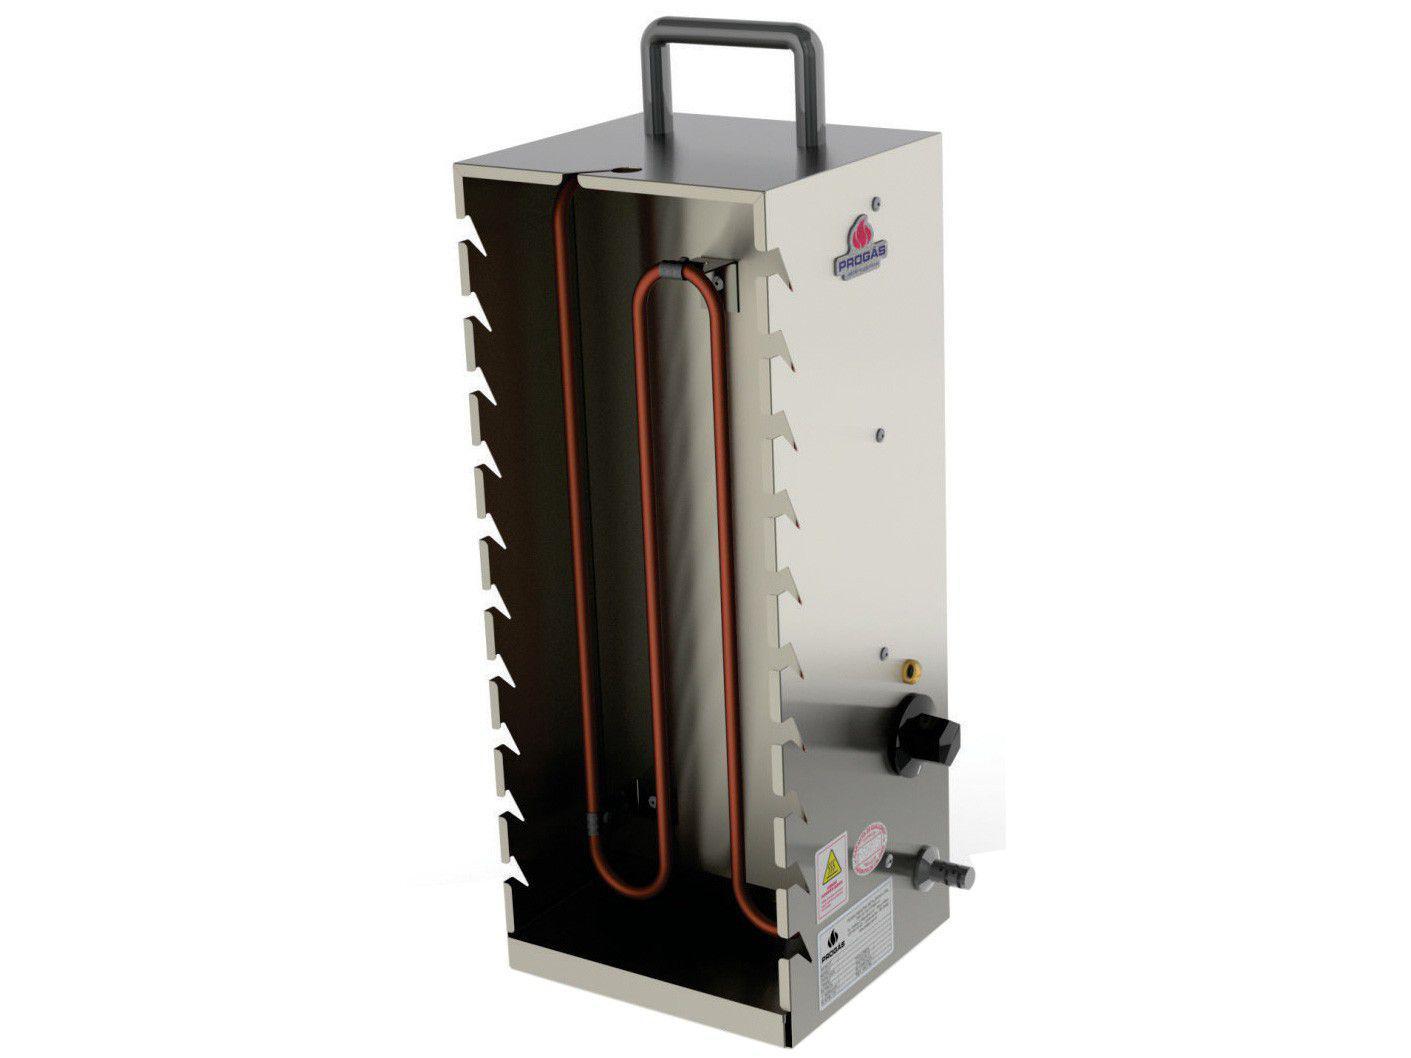 Churrasqueira Industrial Elétrica Inox Progás - PR-199E